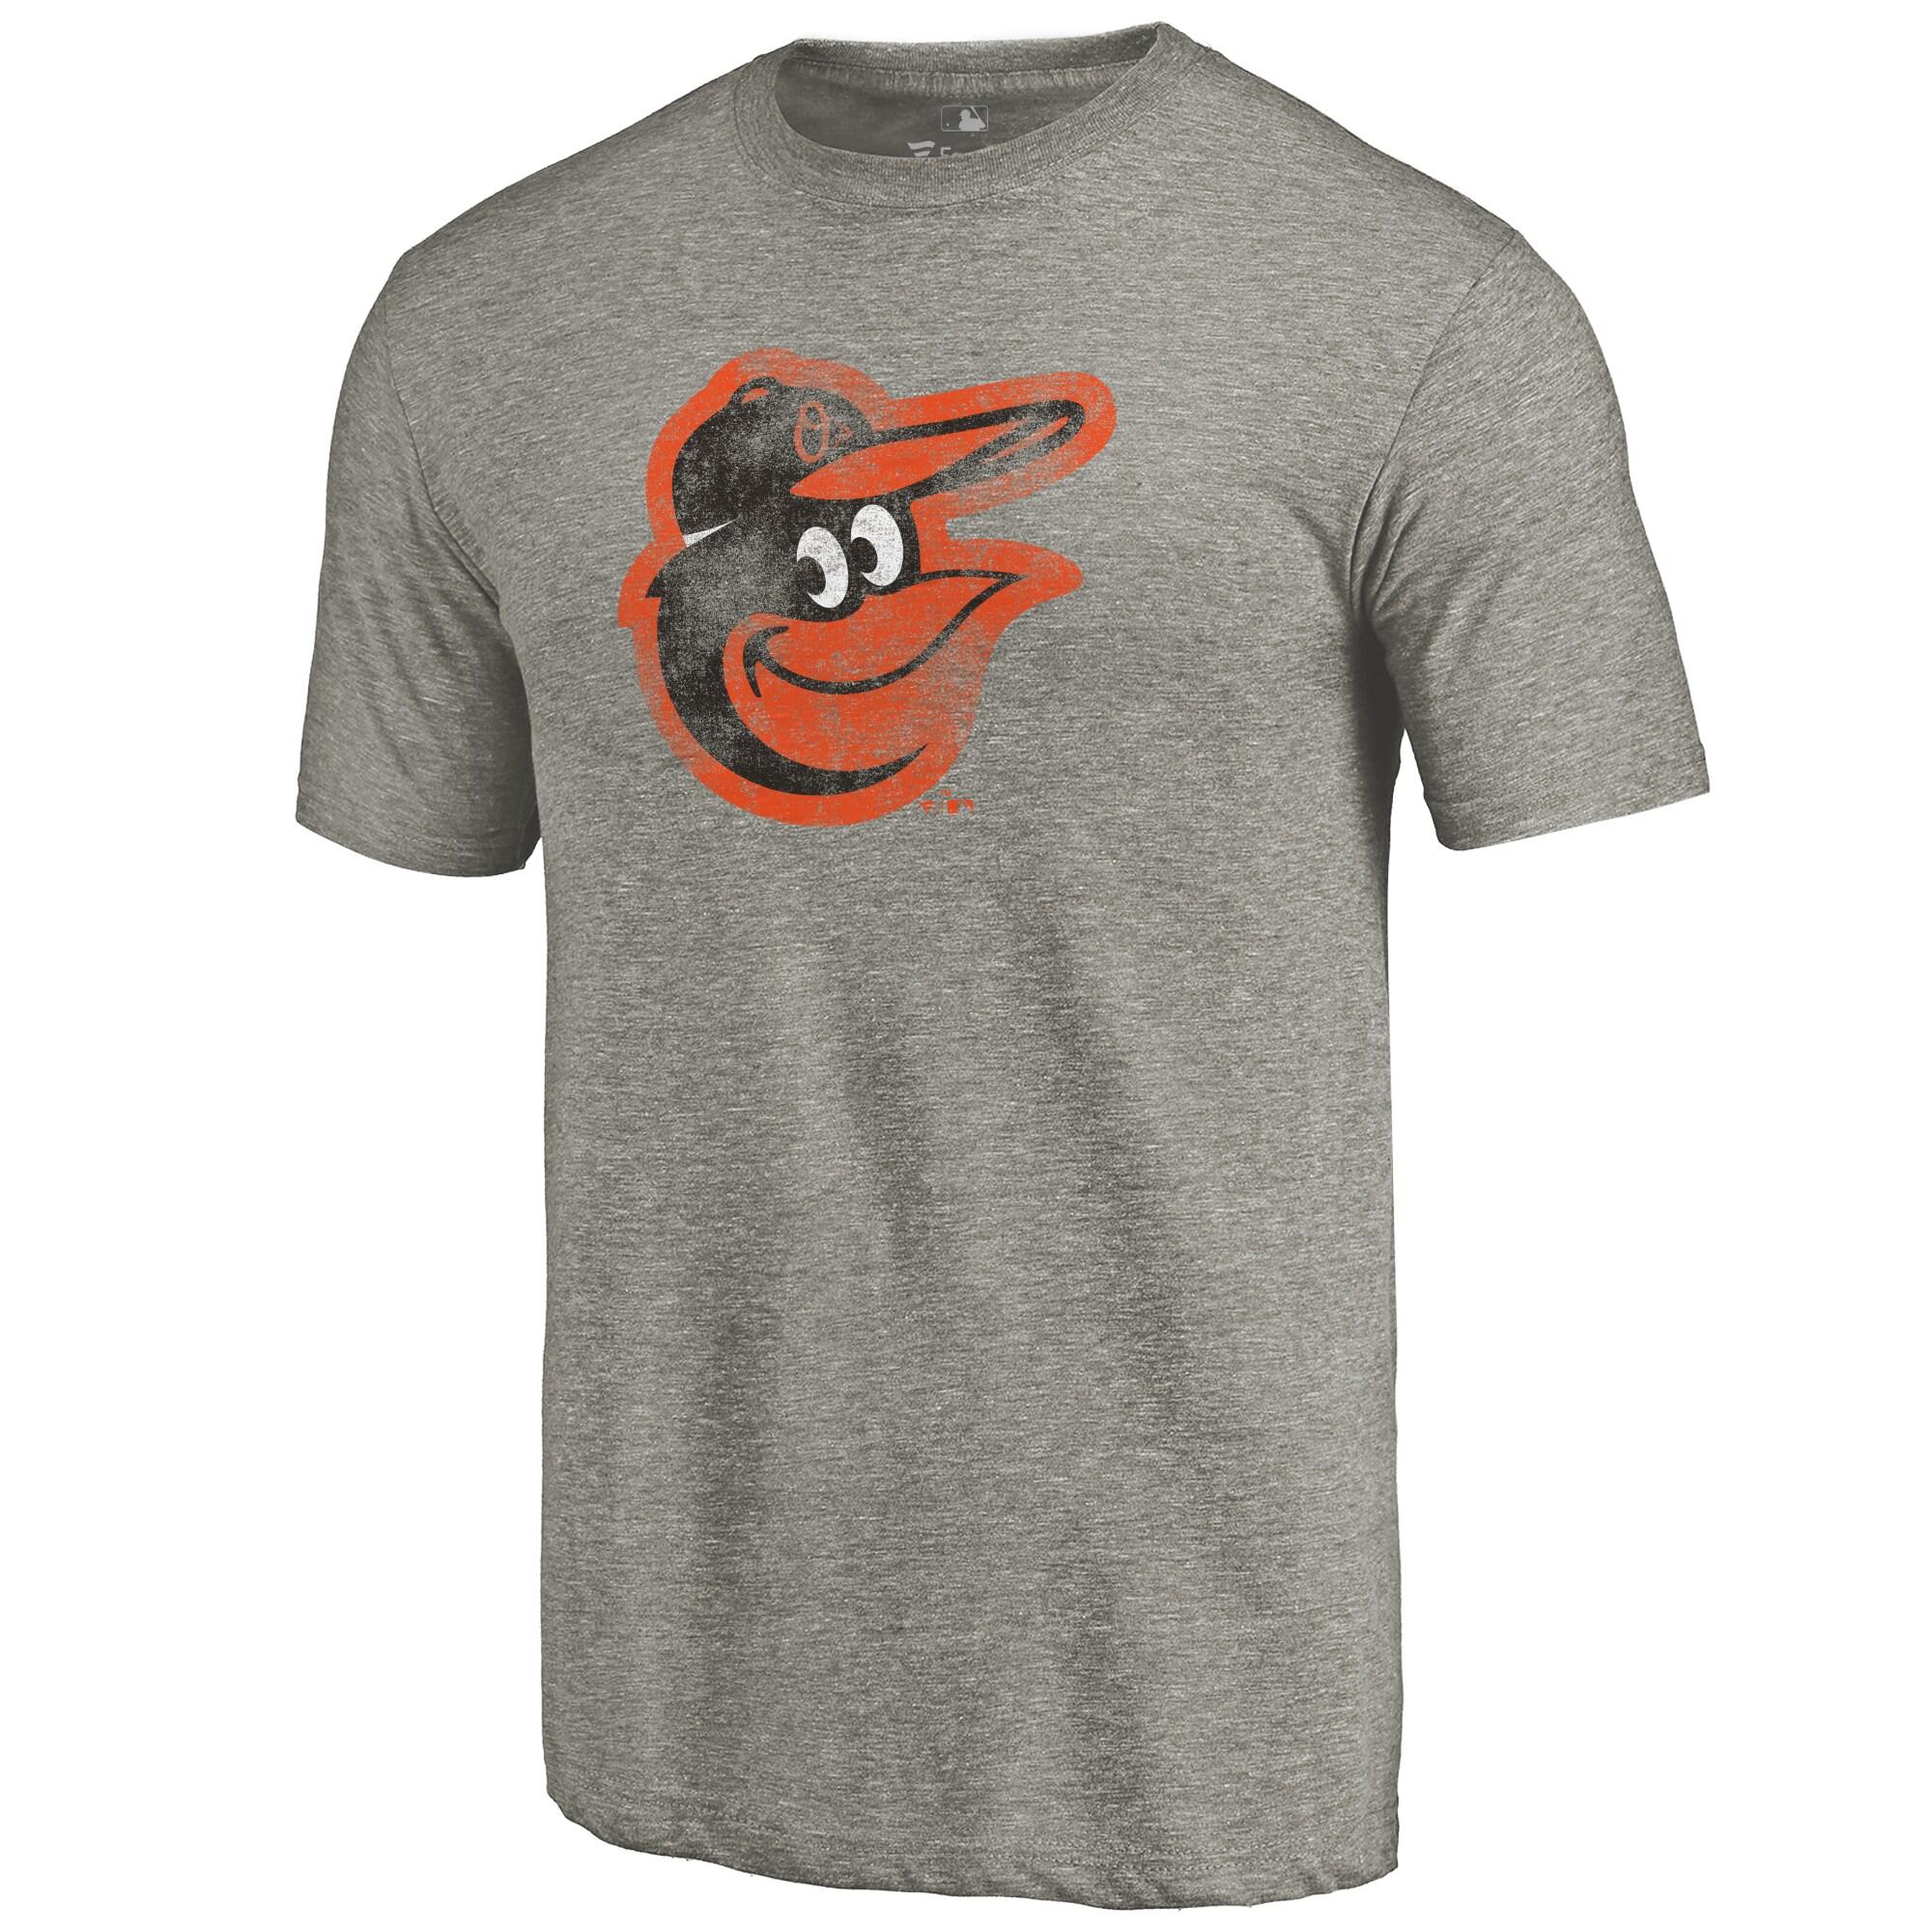 Baltimore Orioles Distressed Team Tri-Blend T-Shirt - Ash